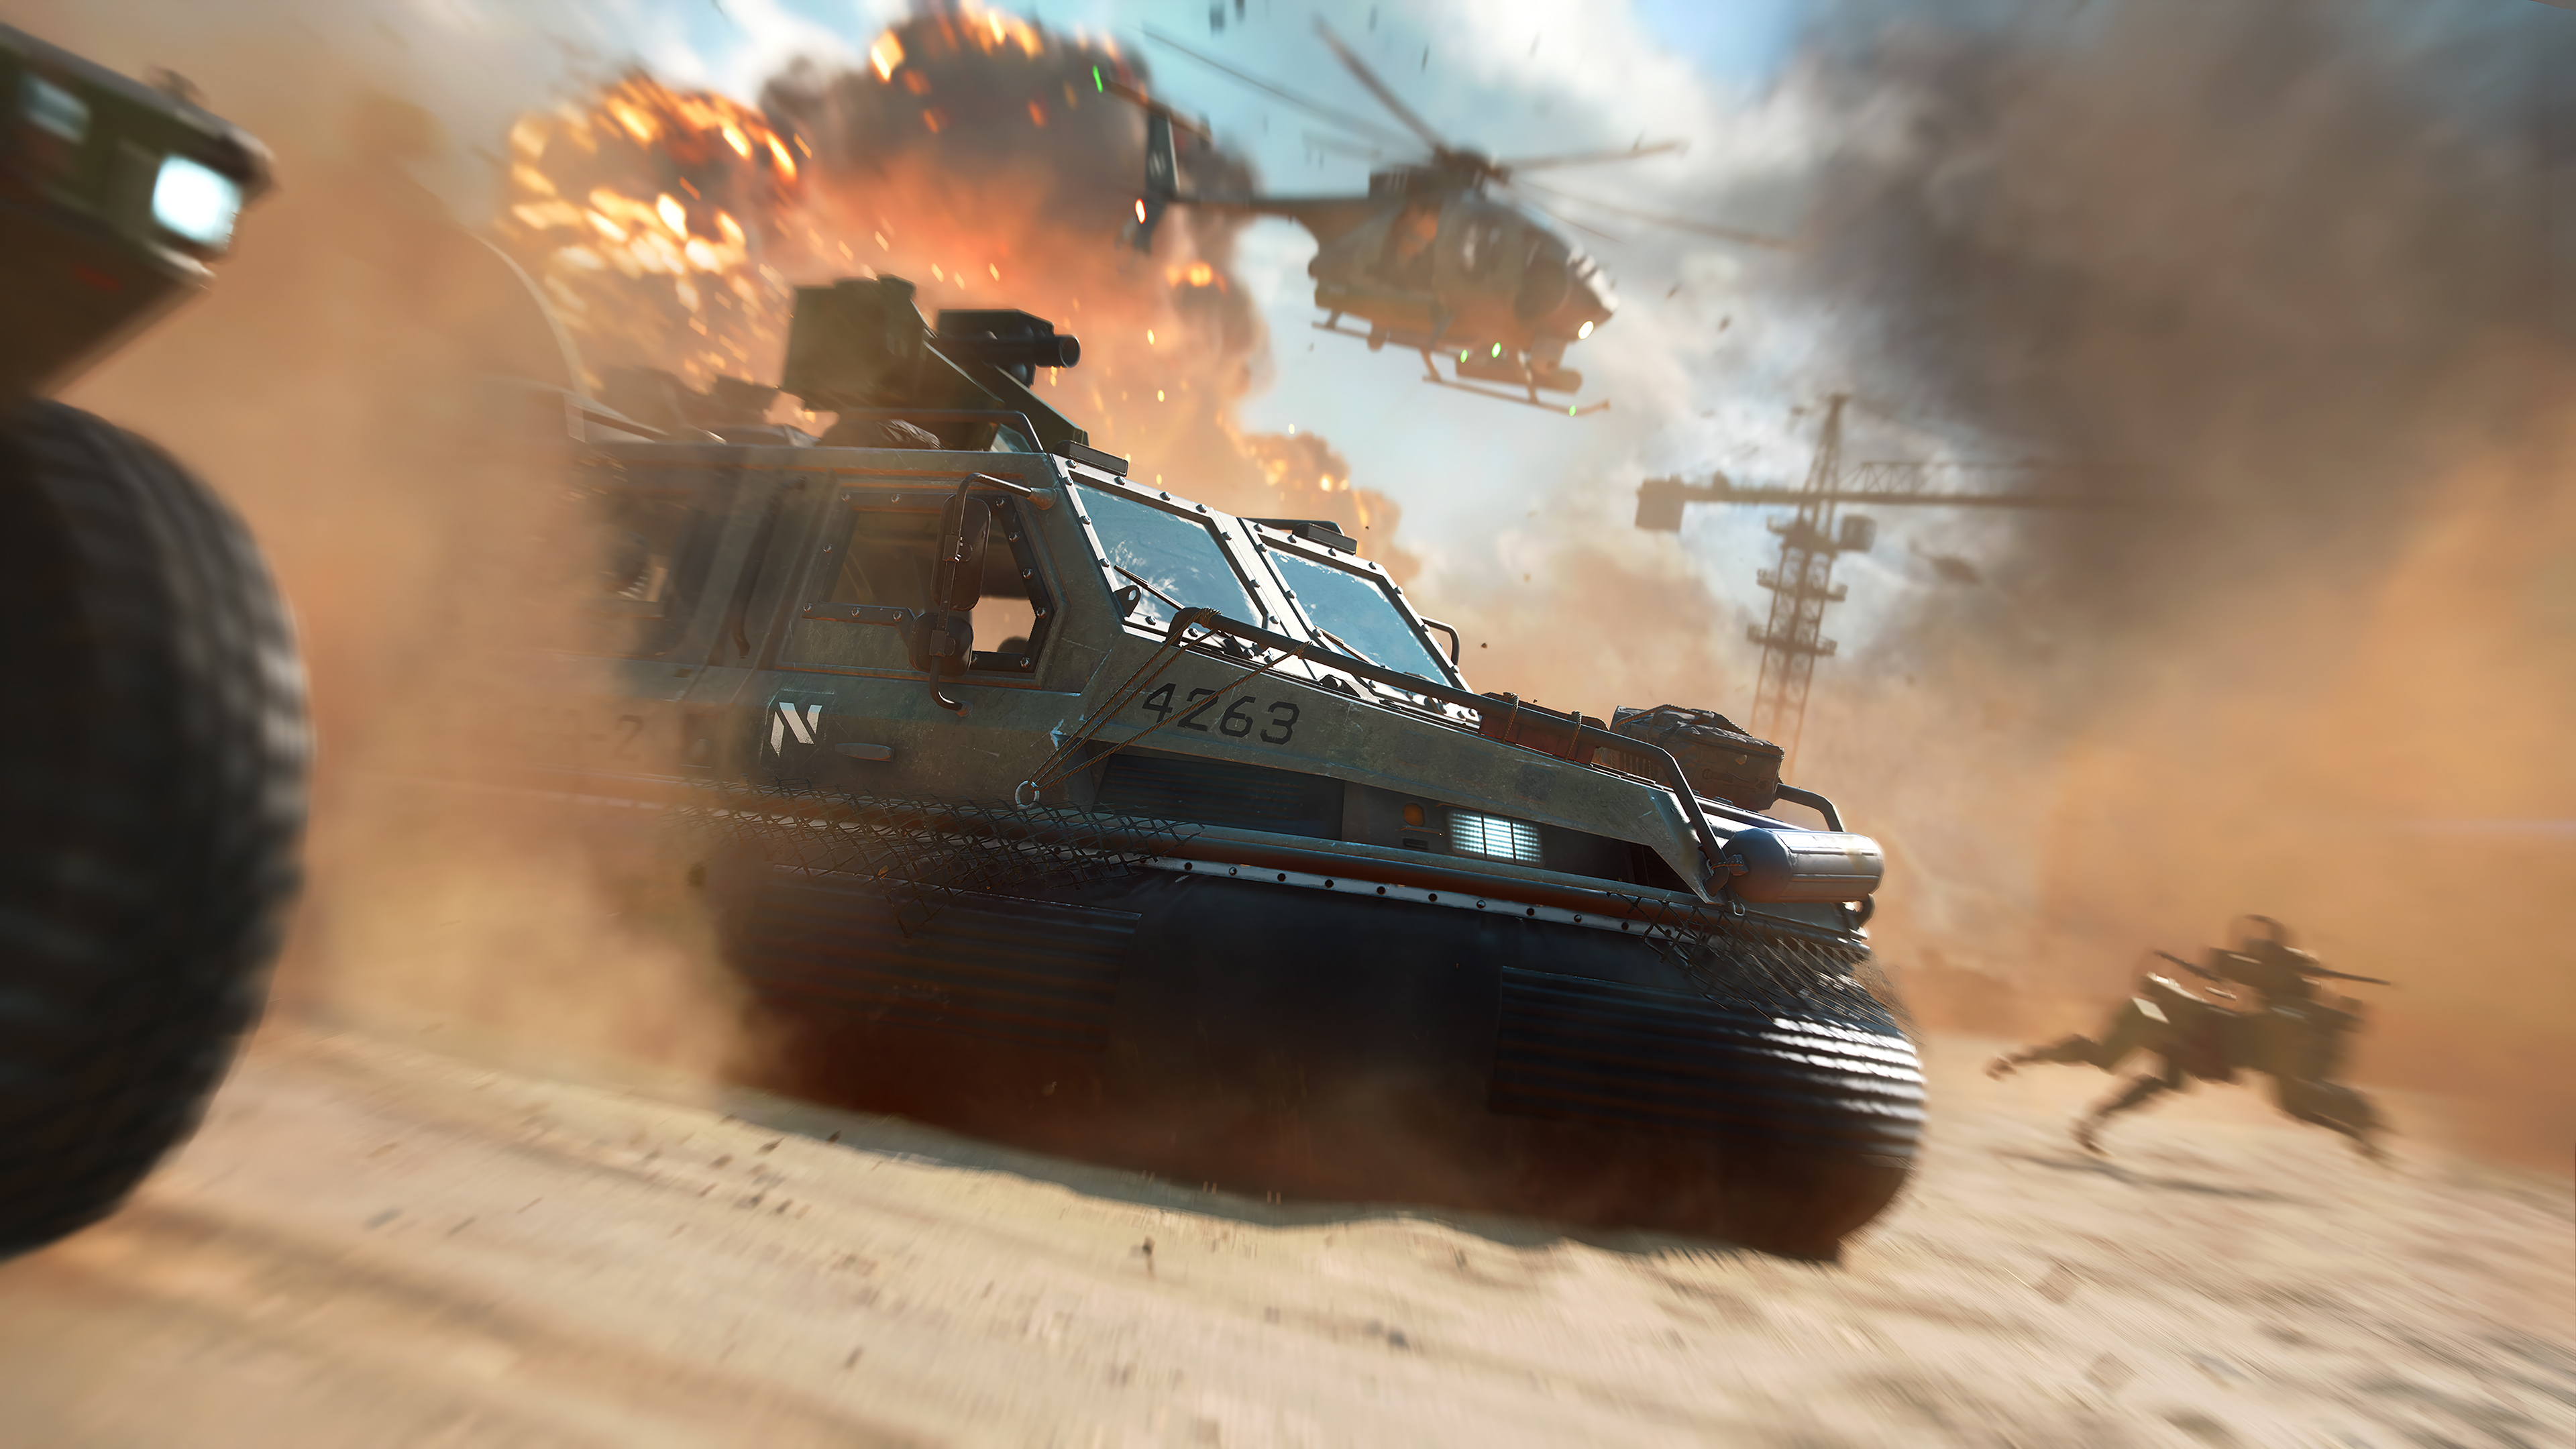 Fondos de pantalla Battlefield 2042